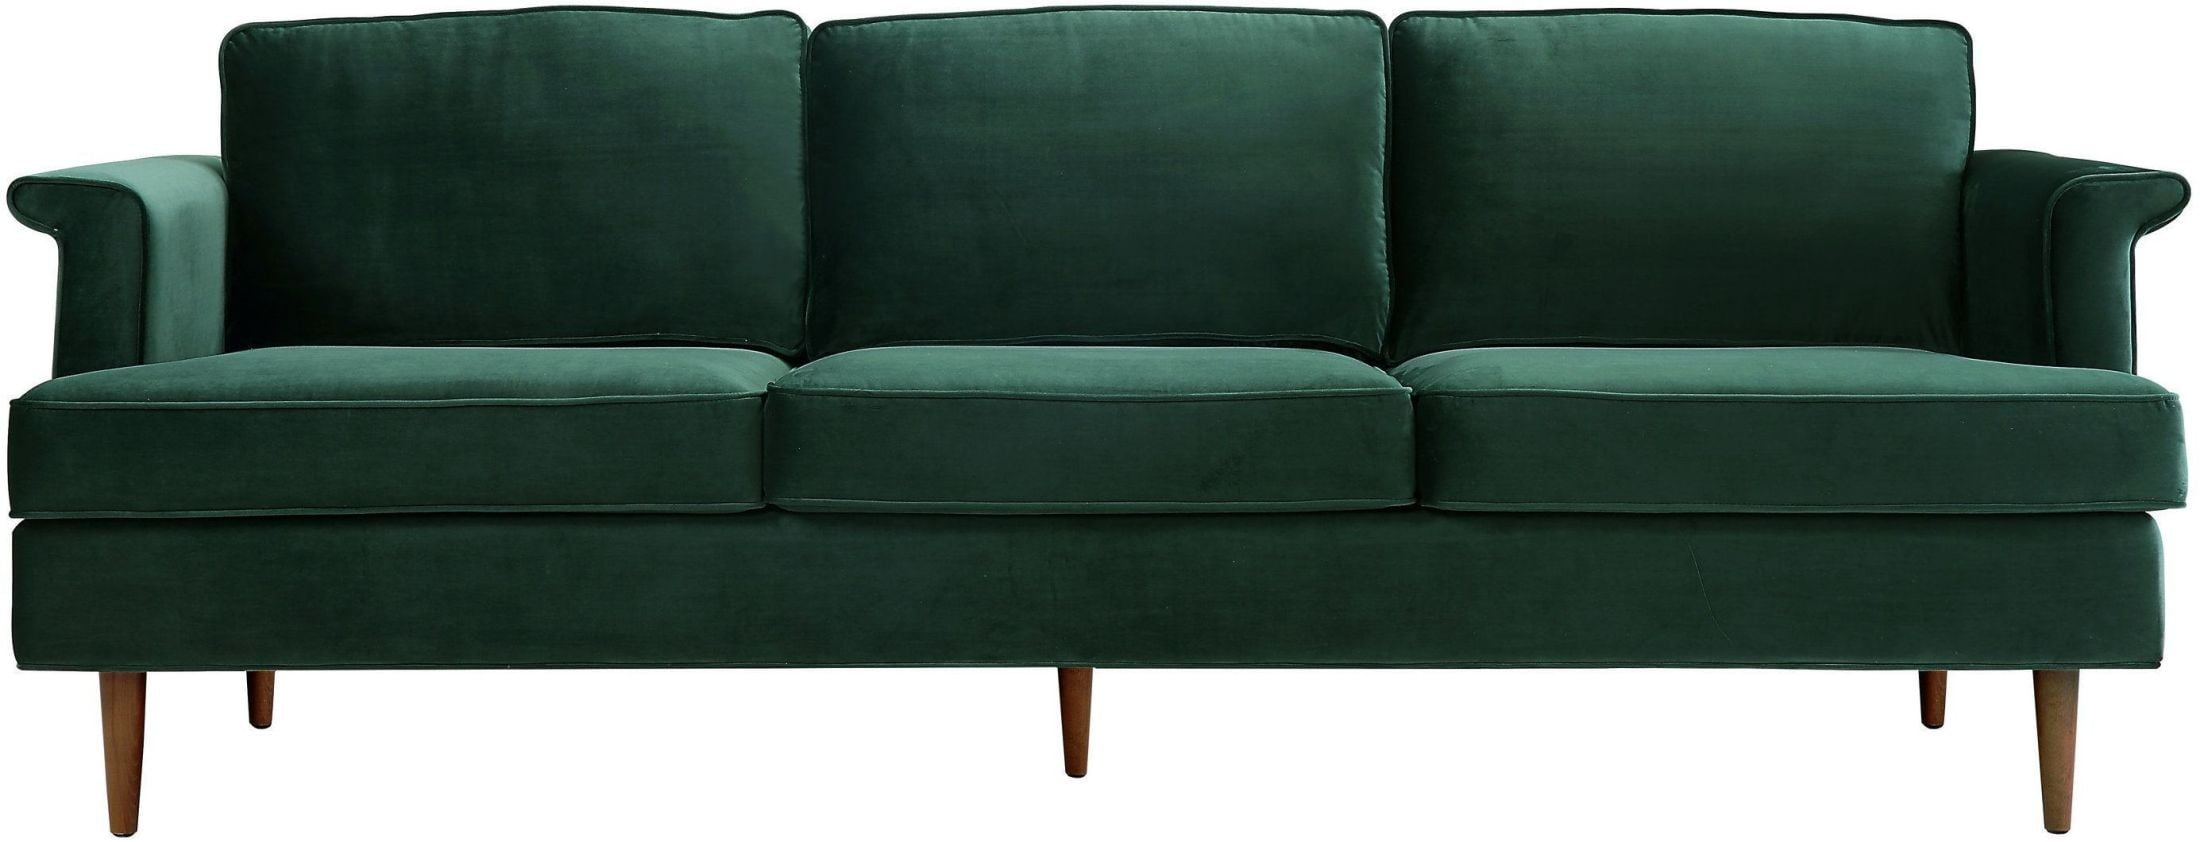 Porter Forest Green Sofa S147 Tov Furniture